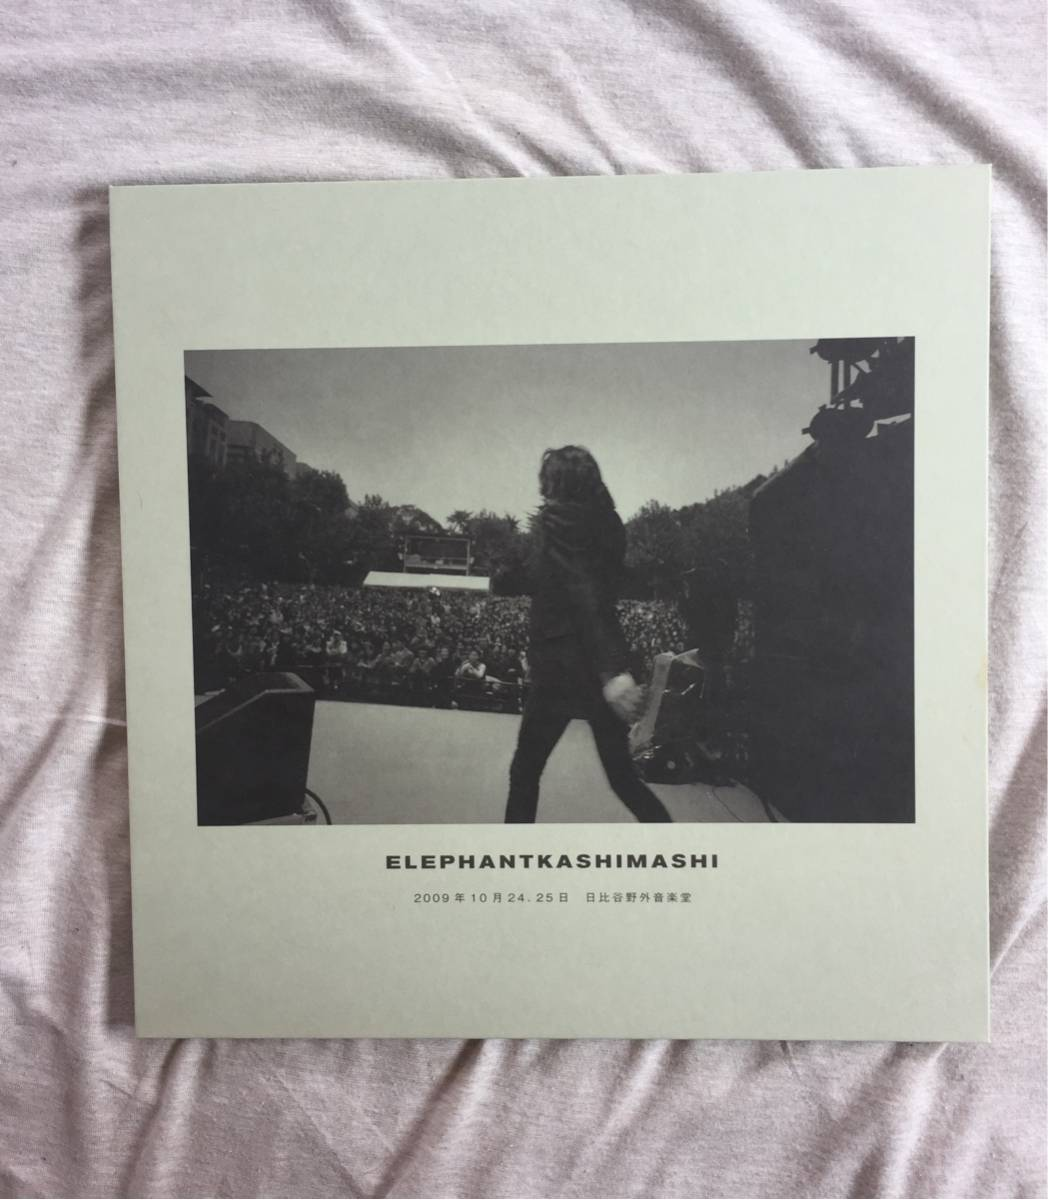 DVD エレファントカシマシ 2009年10月24/25日 日比谷野外音楽堂 完全初回限定盤 ライブグッズの画像